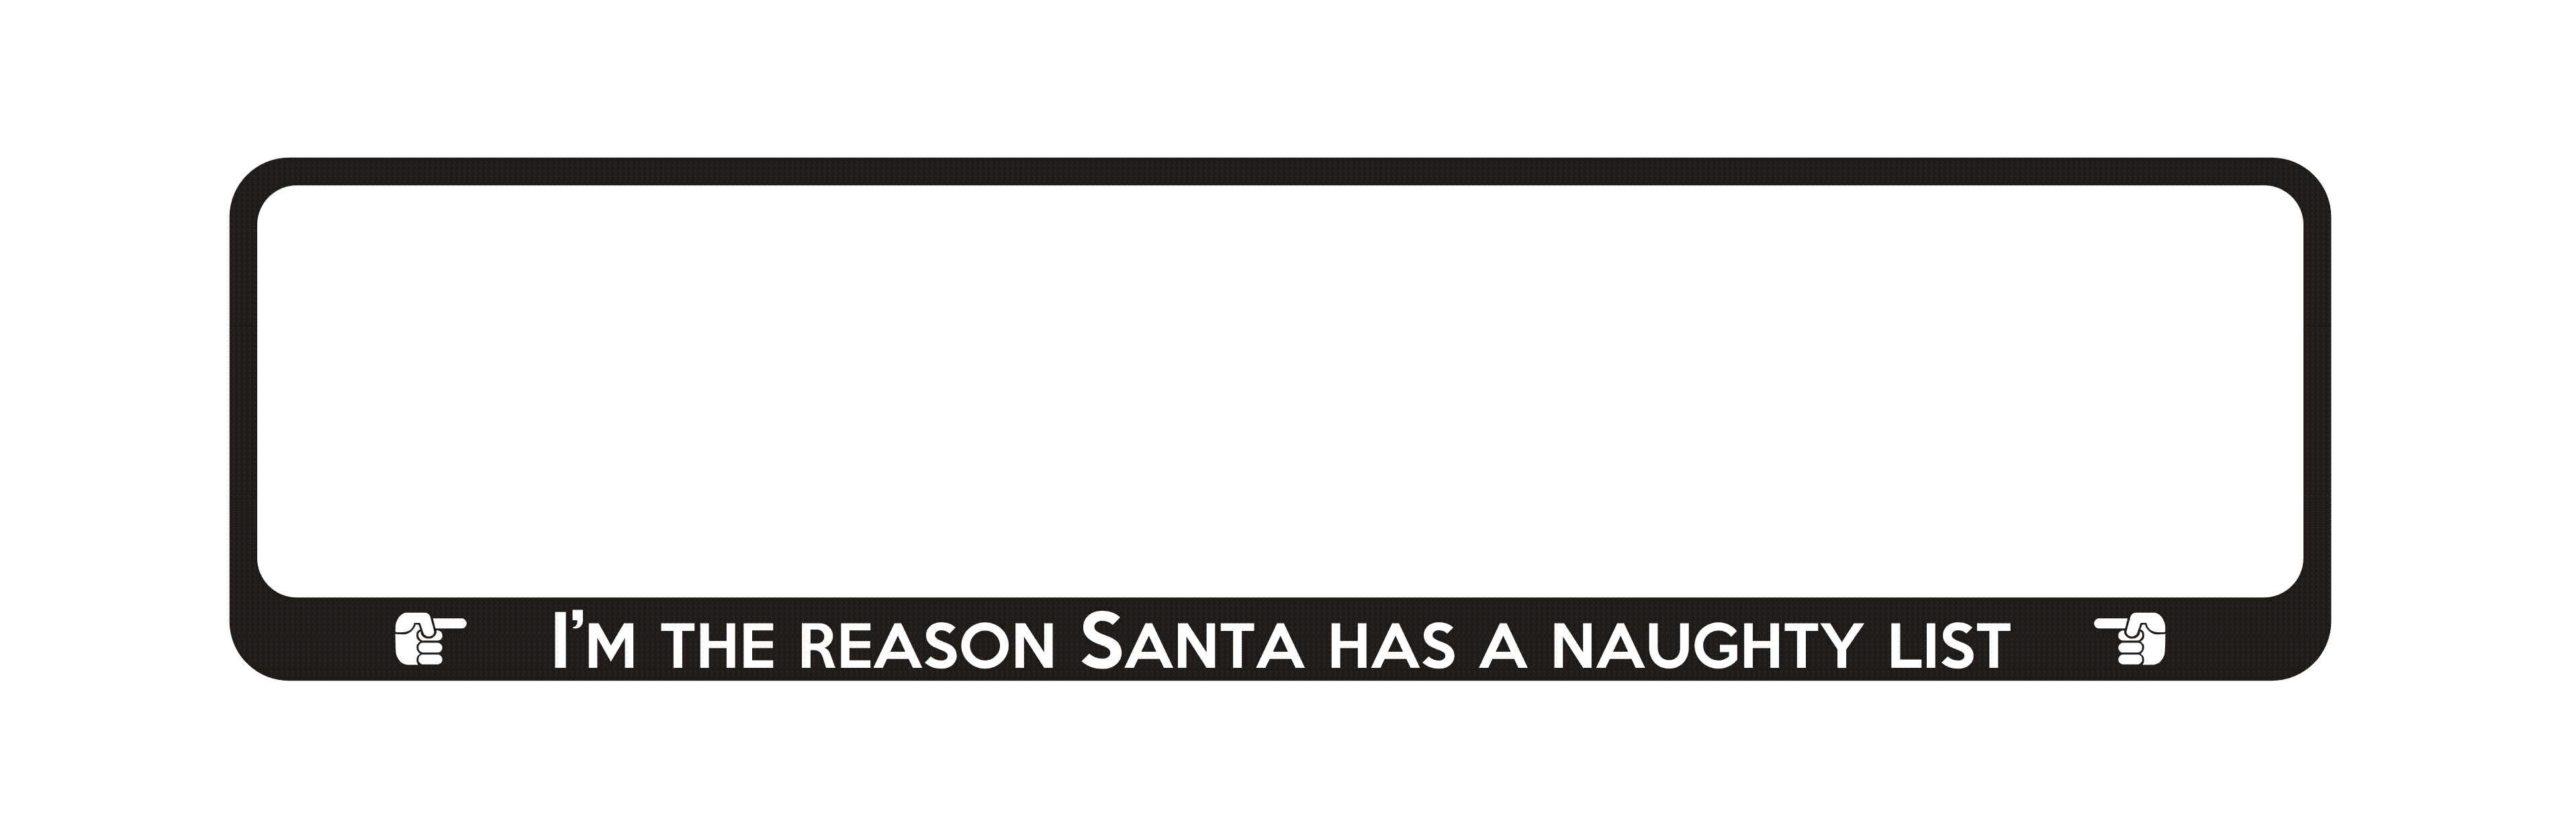 LATSIGN Auto numura turētājs - I'm the reason snata has a naughty list